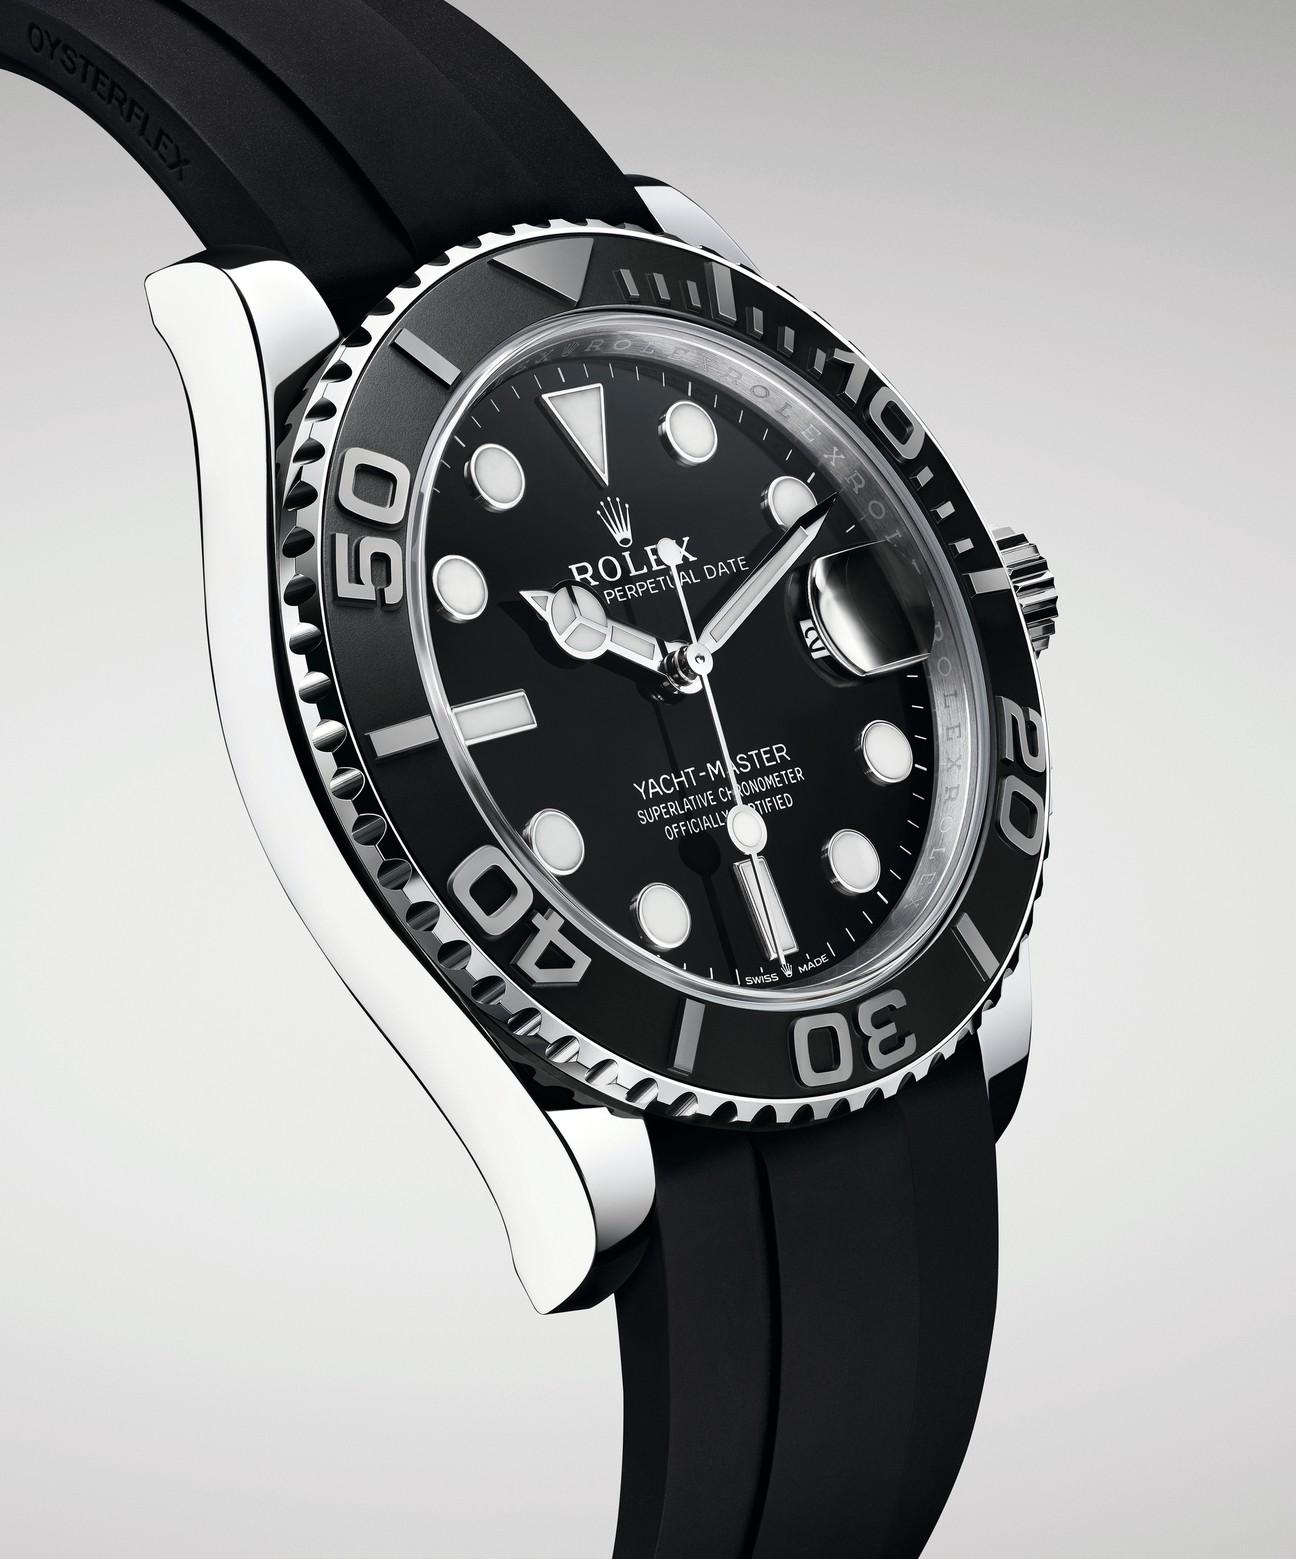 267c9c6720 Rolex  Τα υπέροχα ολοκαίνουργια μοντέλα της σειράς Οyster